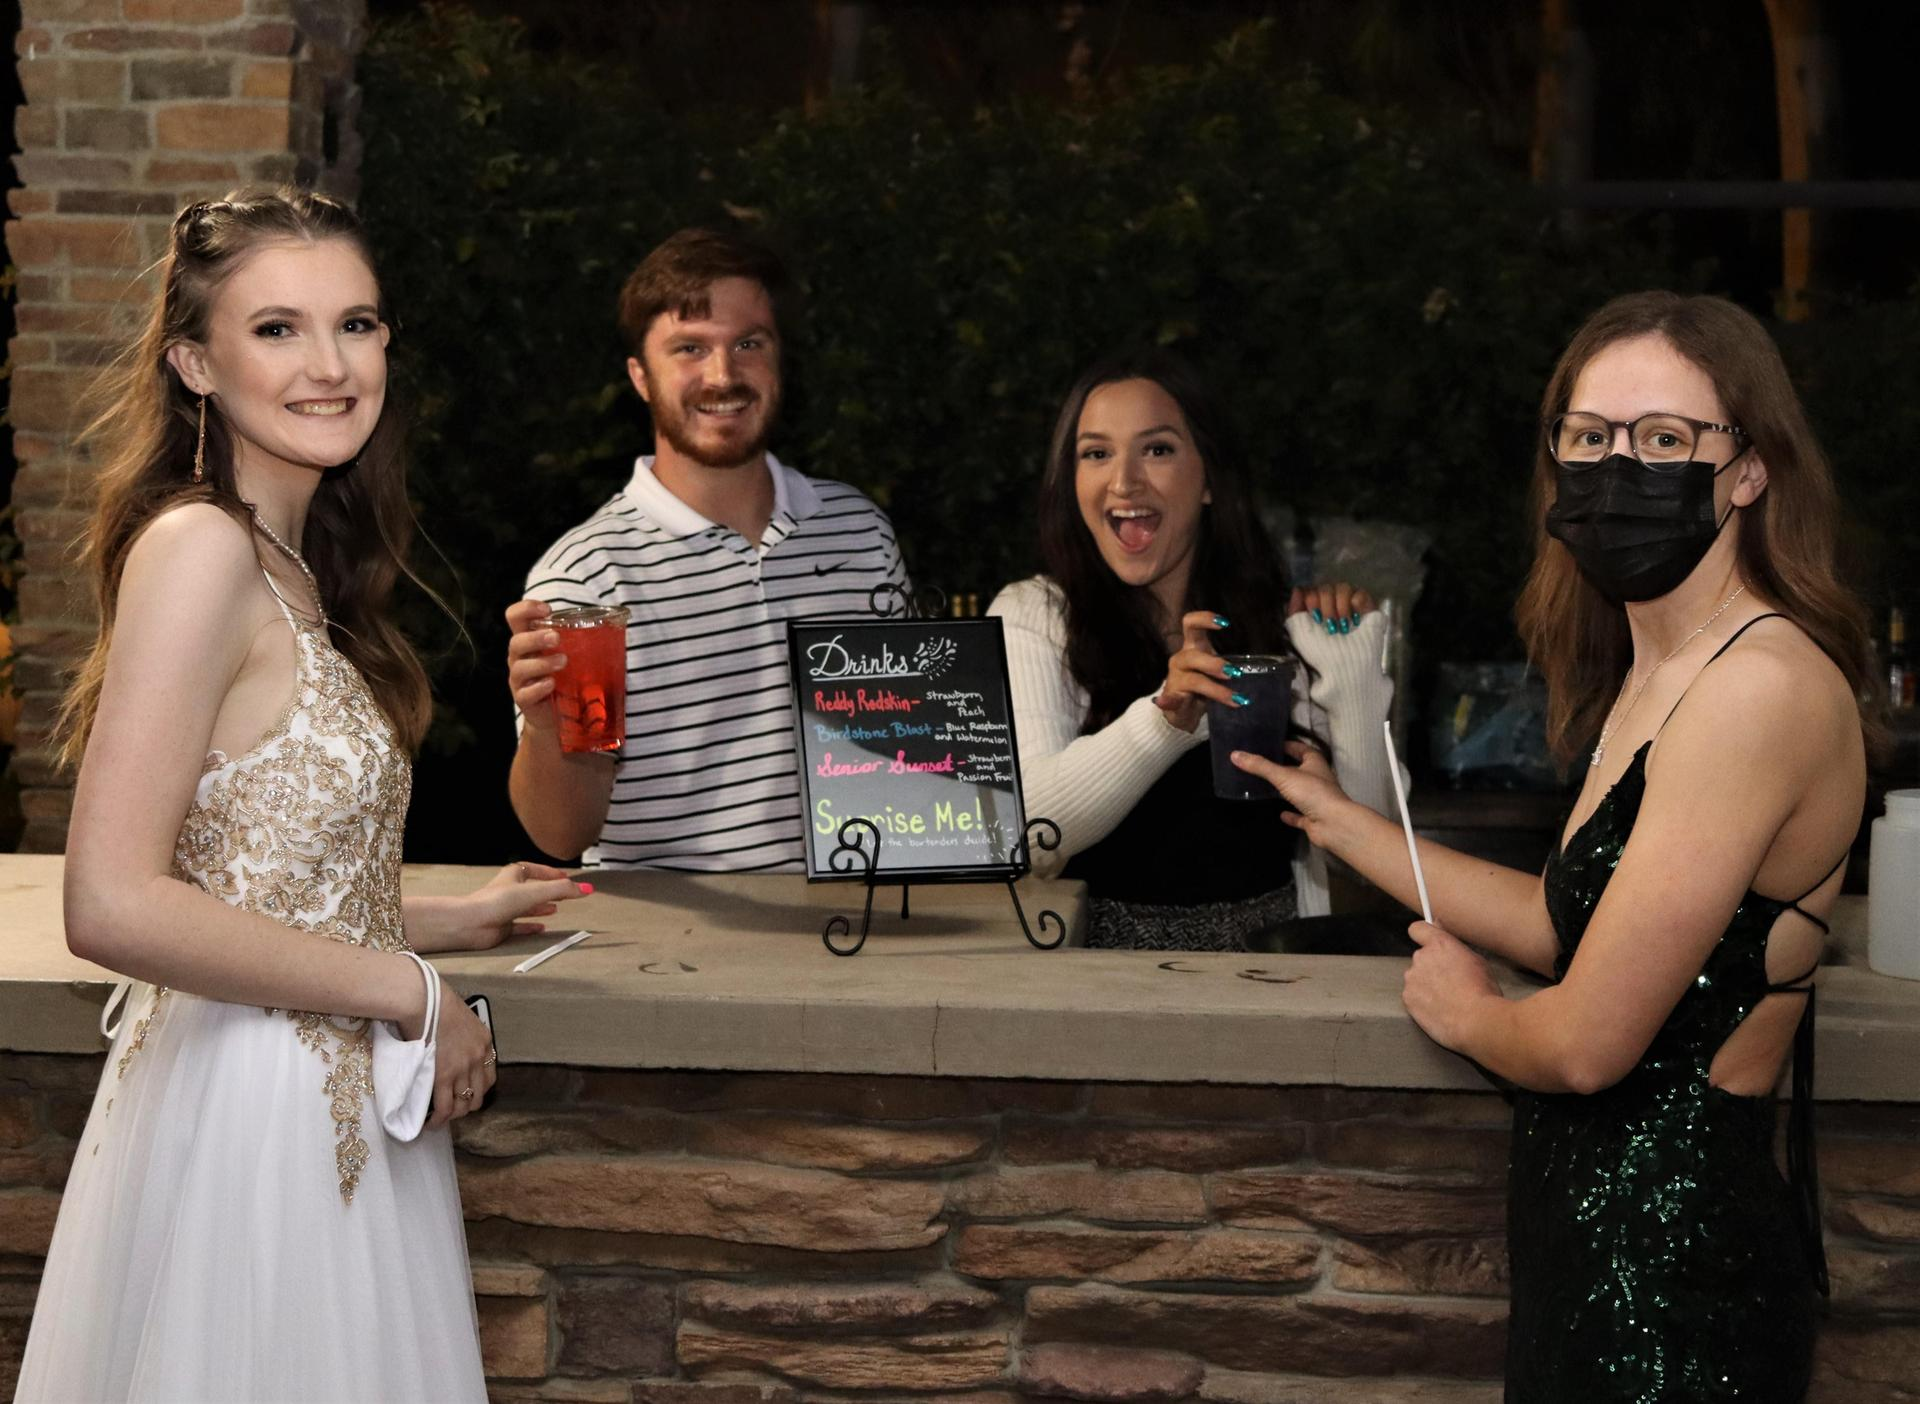 Staff at prom